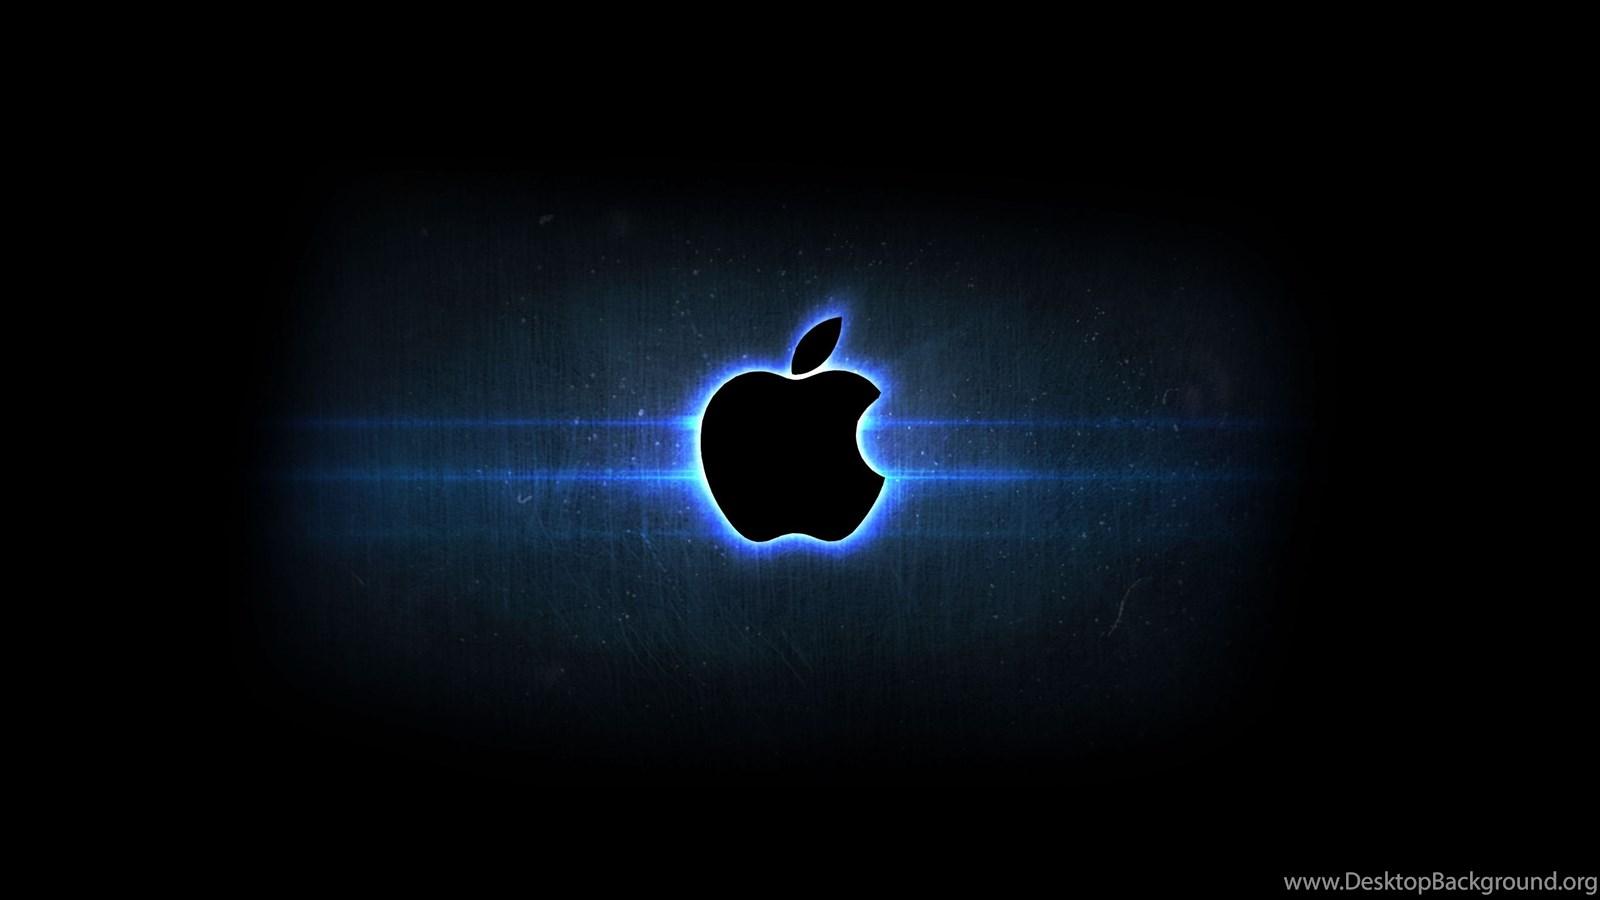 Apple Wallpapers Black Cool Wallpapers Hd 1080p Desktop Background